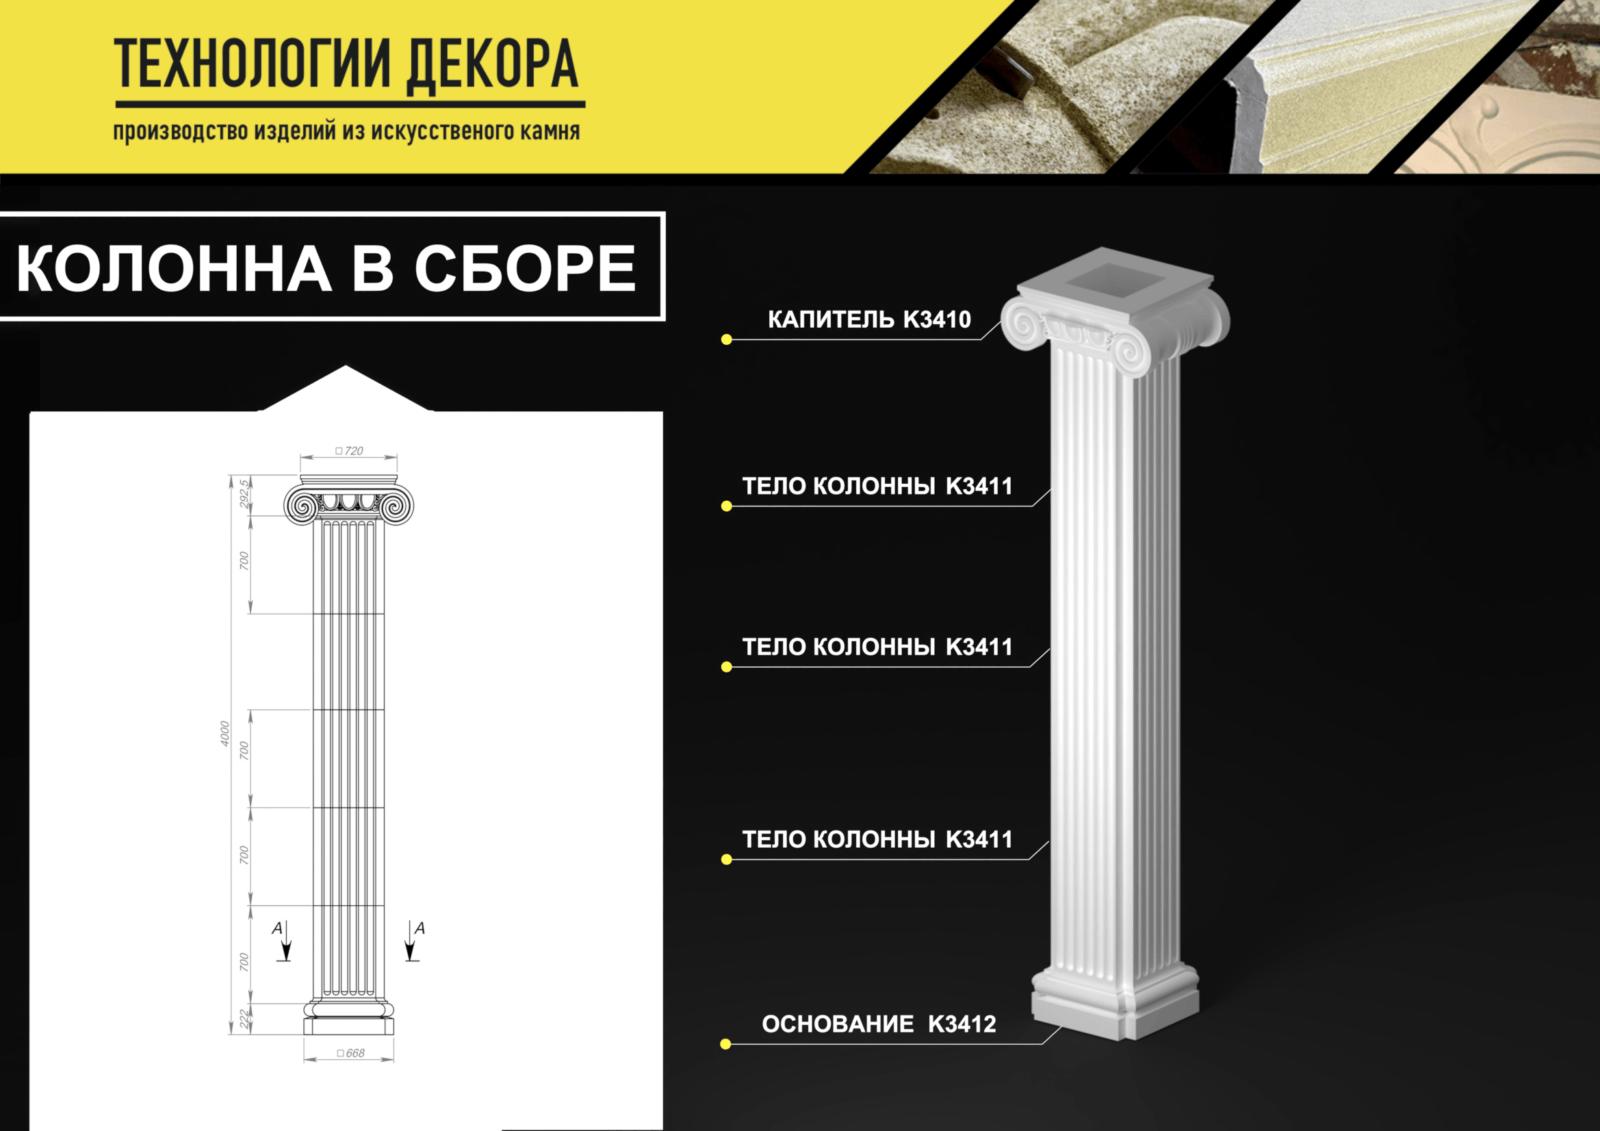 роизводство колонн из архикамня и стеклофибробетона.